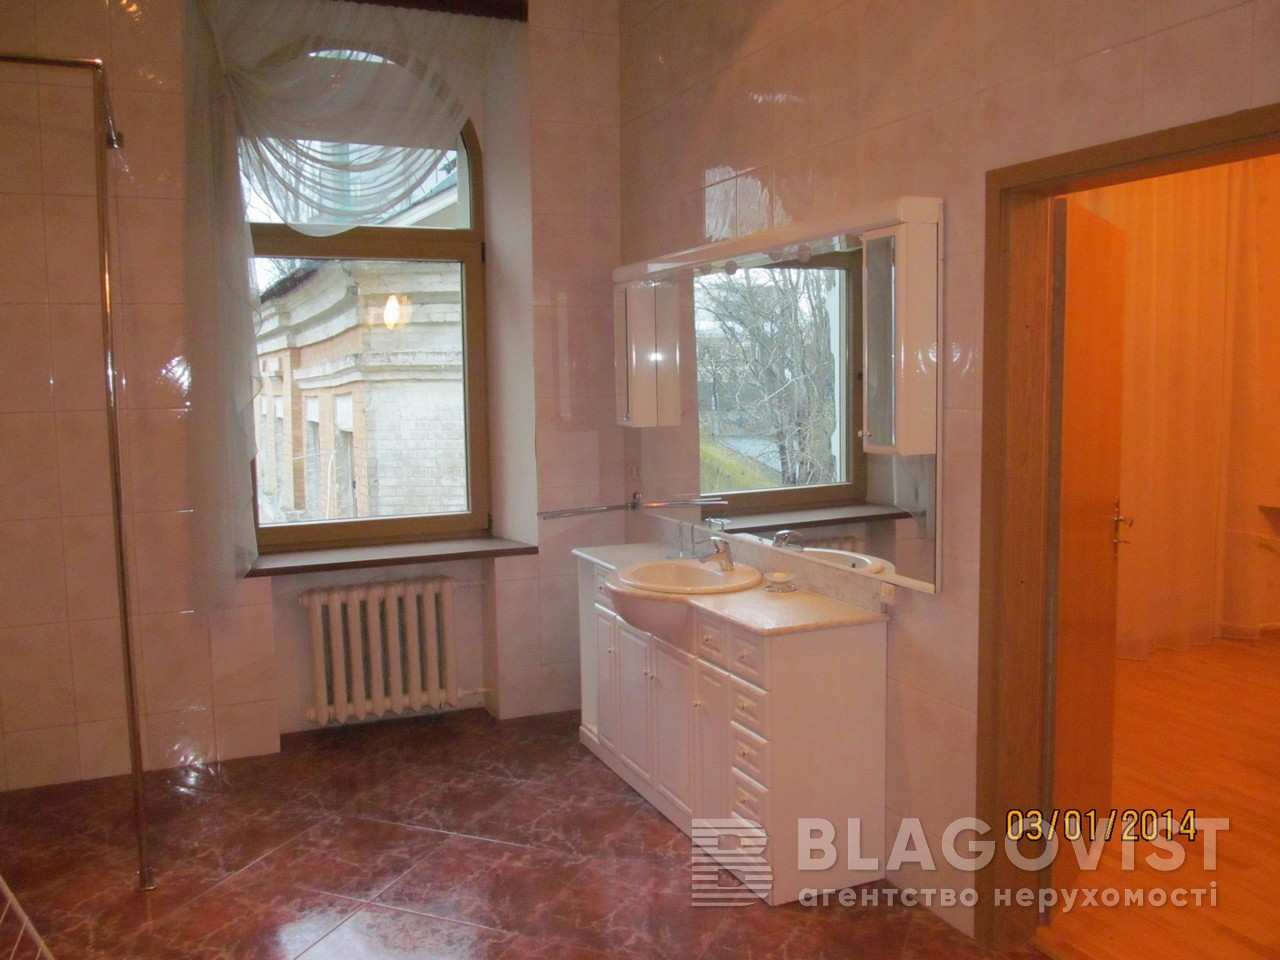 Квартира G-12026, Городецкого Архитектора, 11б, Киев - Фото 15